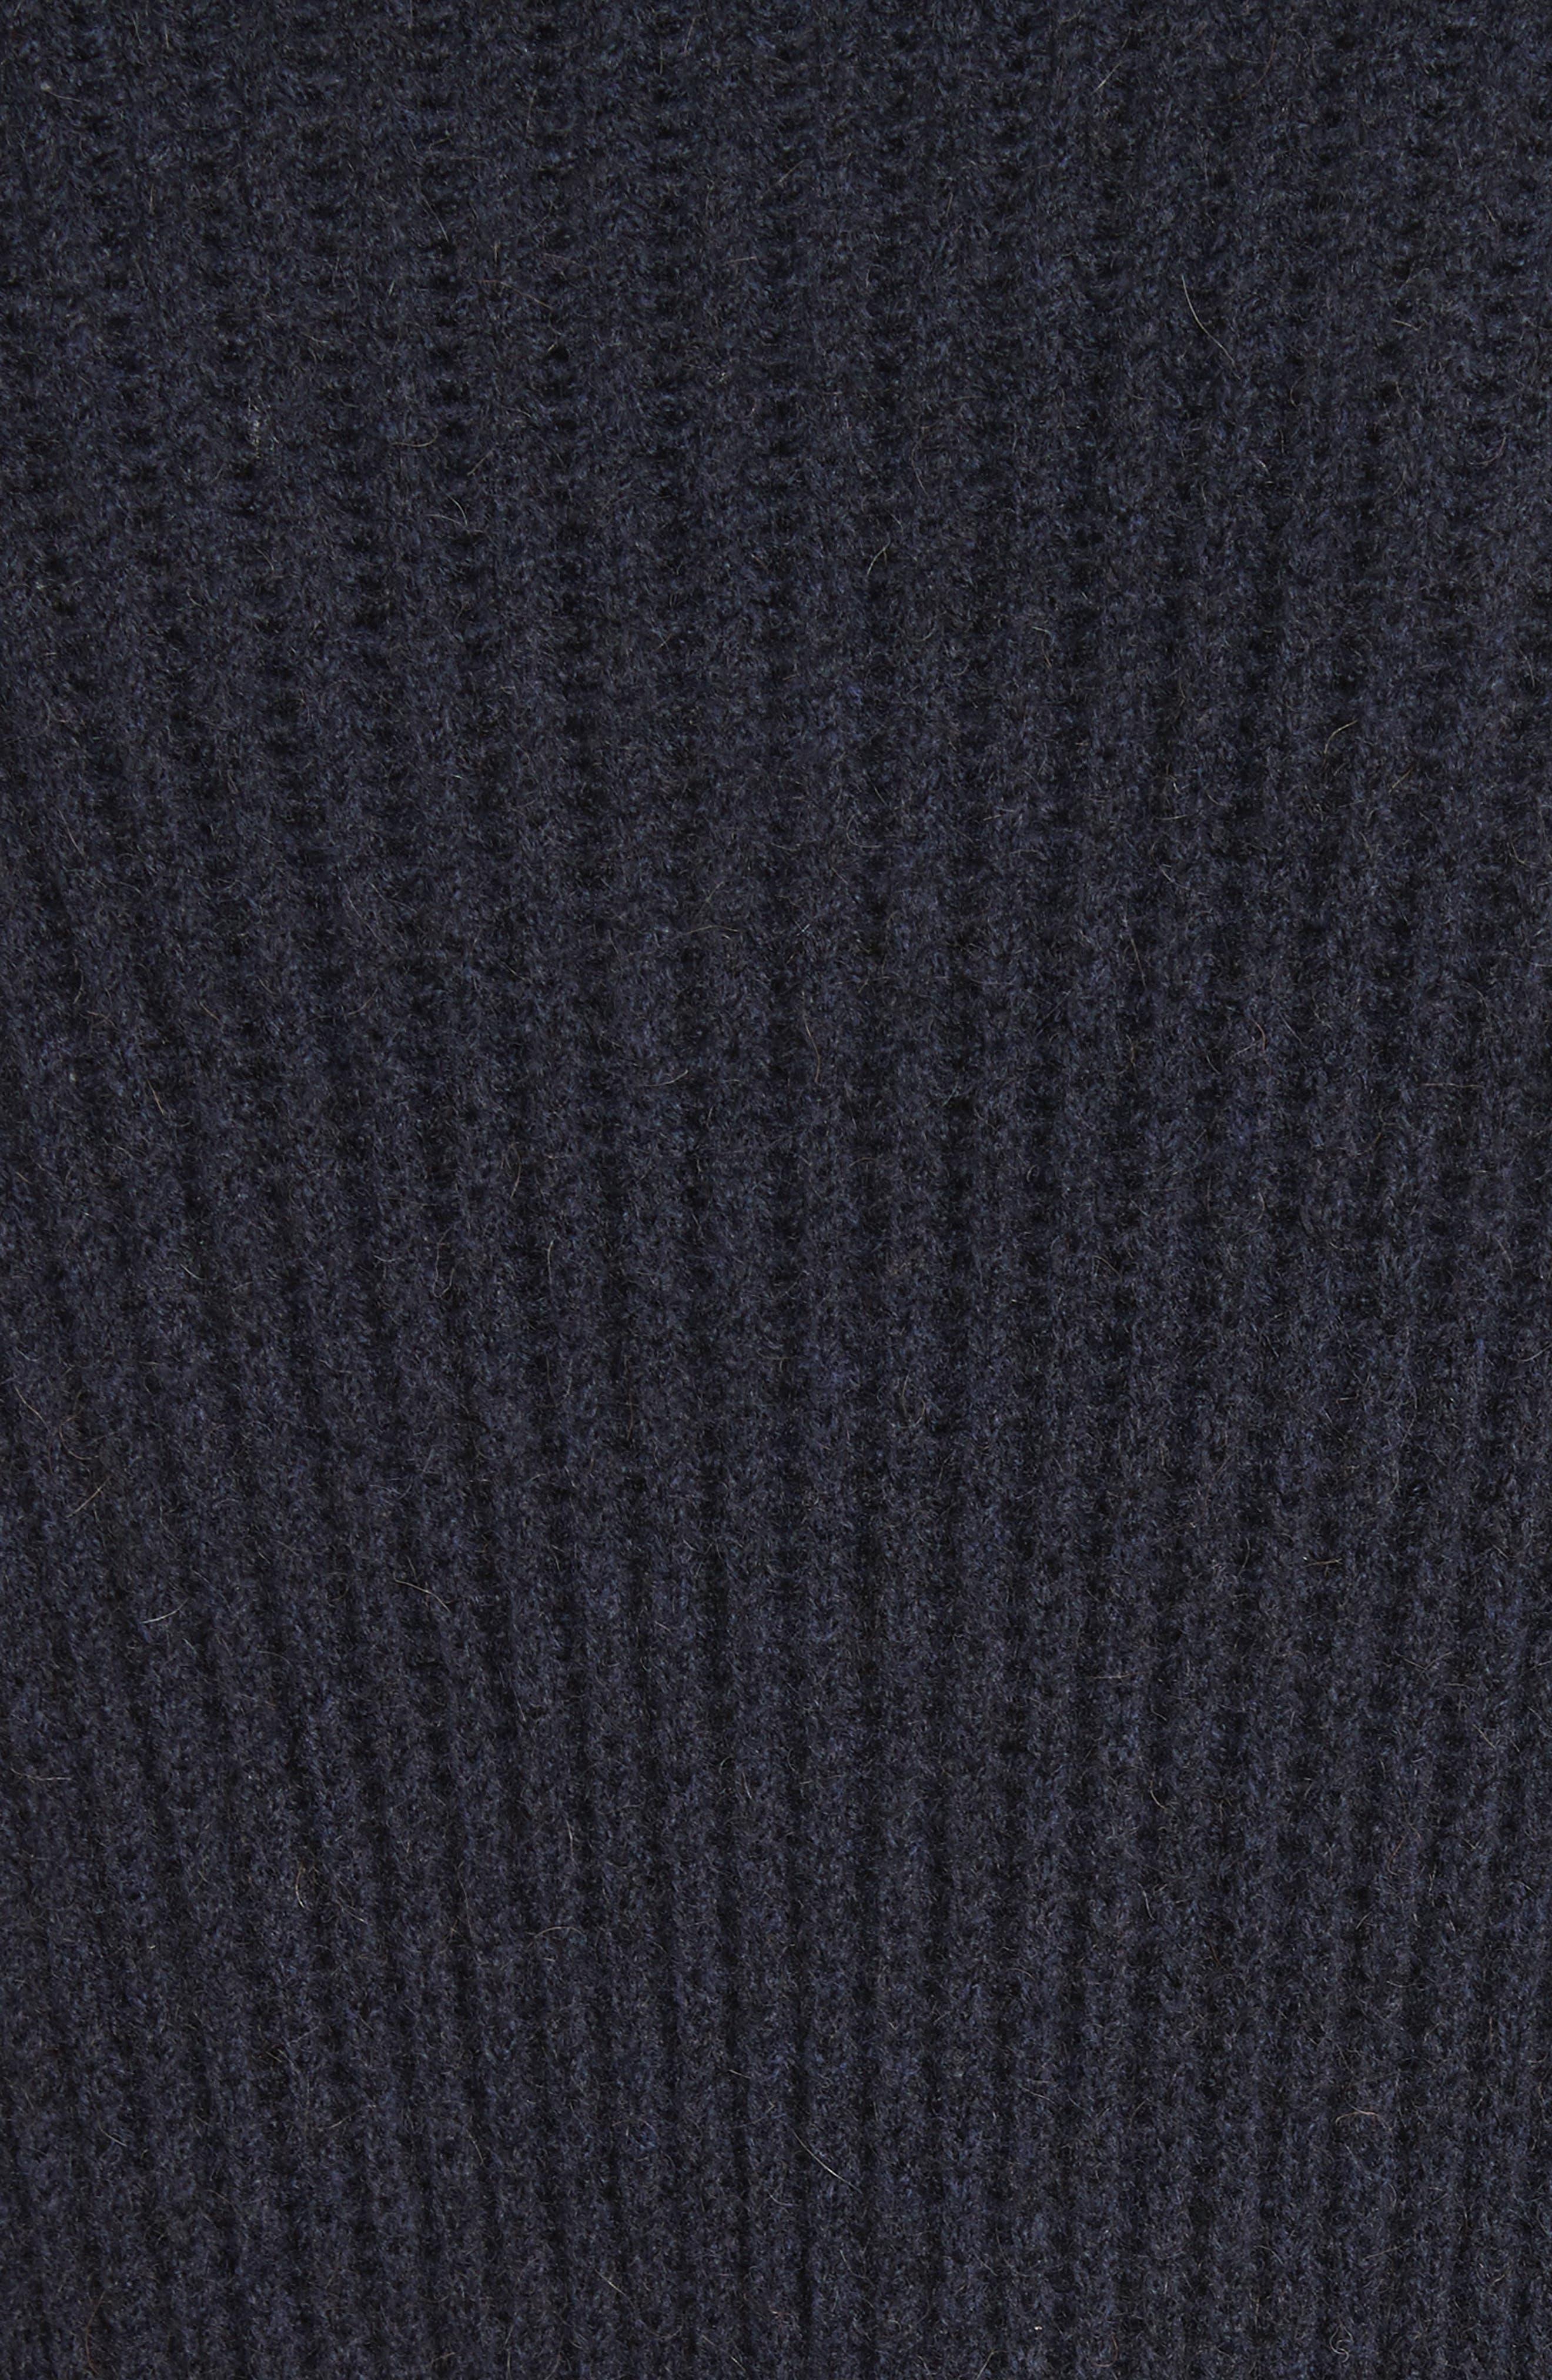 James Merino Wool Blend Cardigan,                             Alternate thumbnail 7, color,                             Midnight